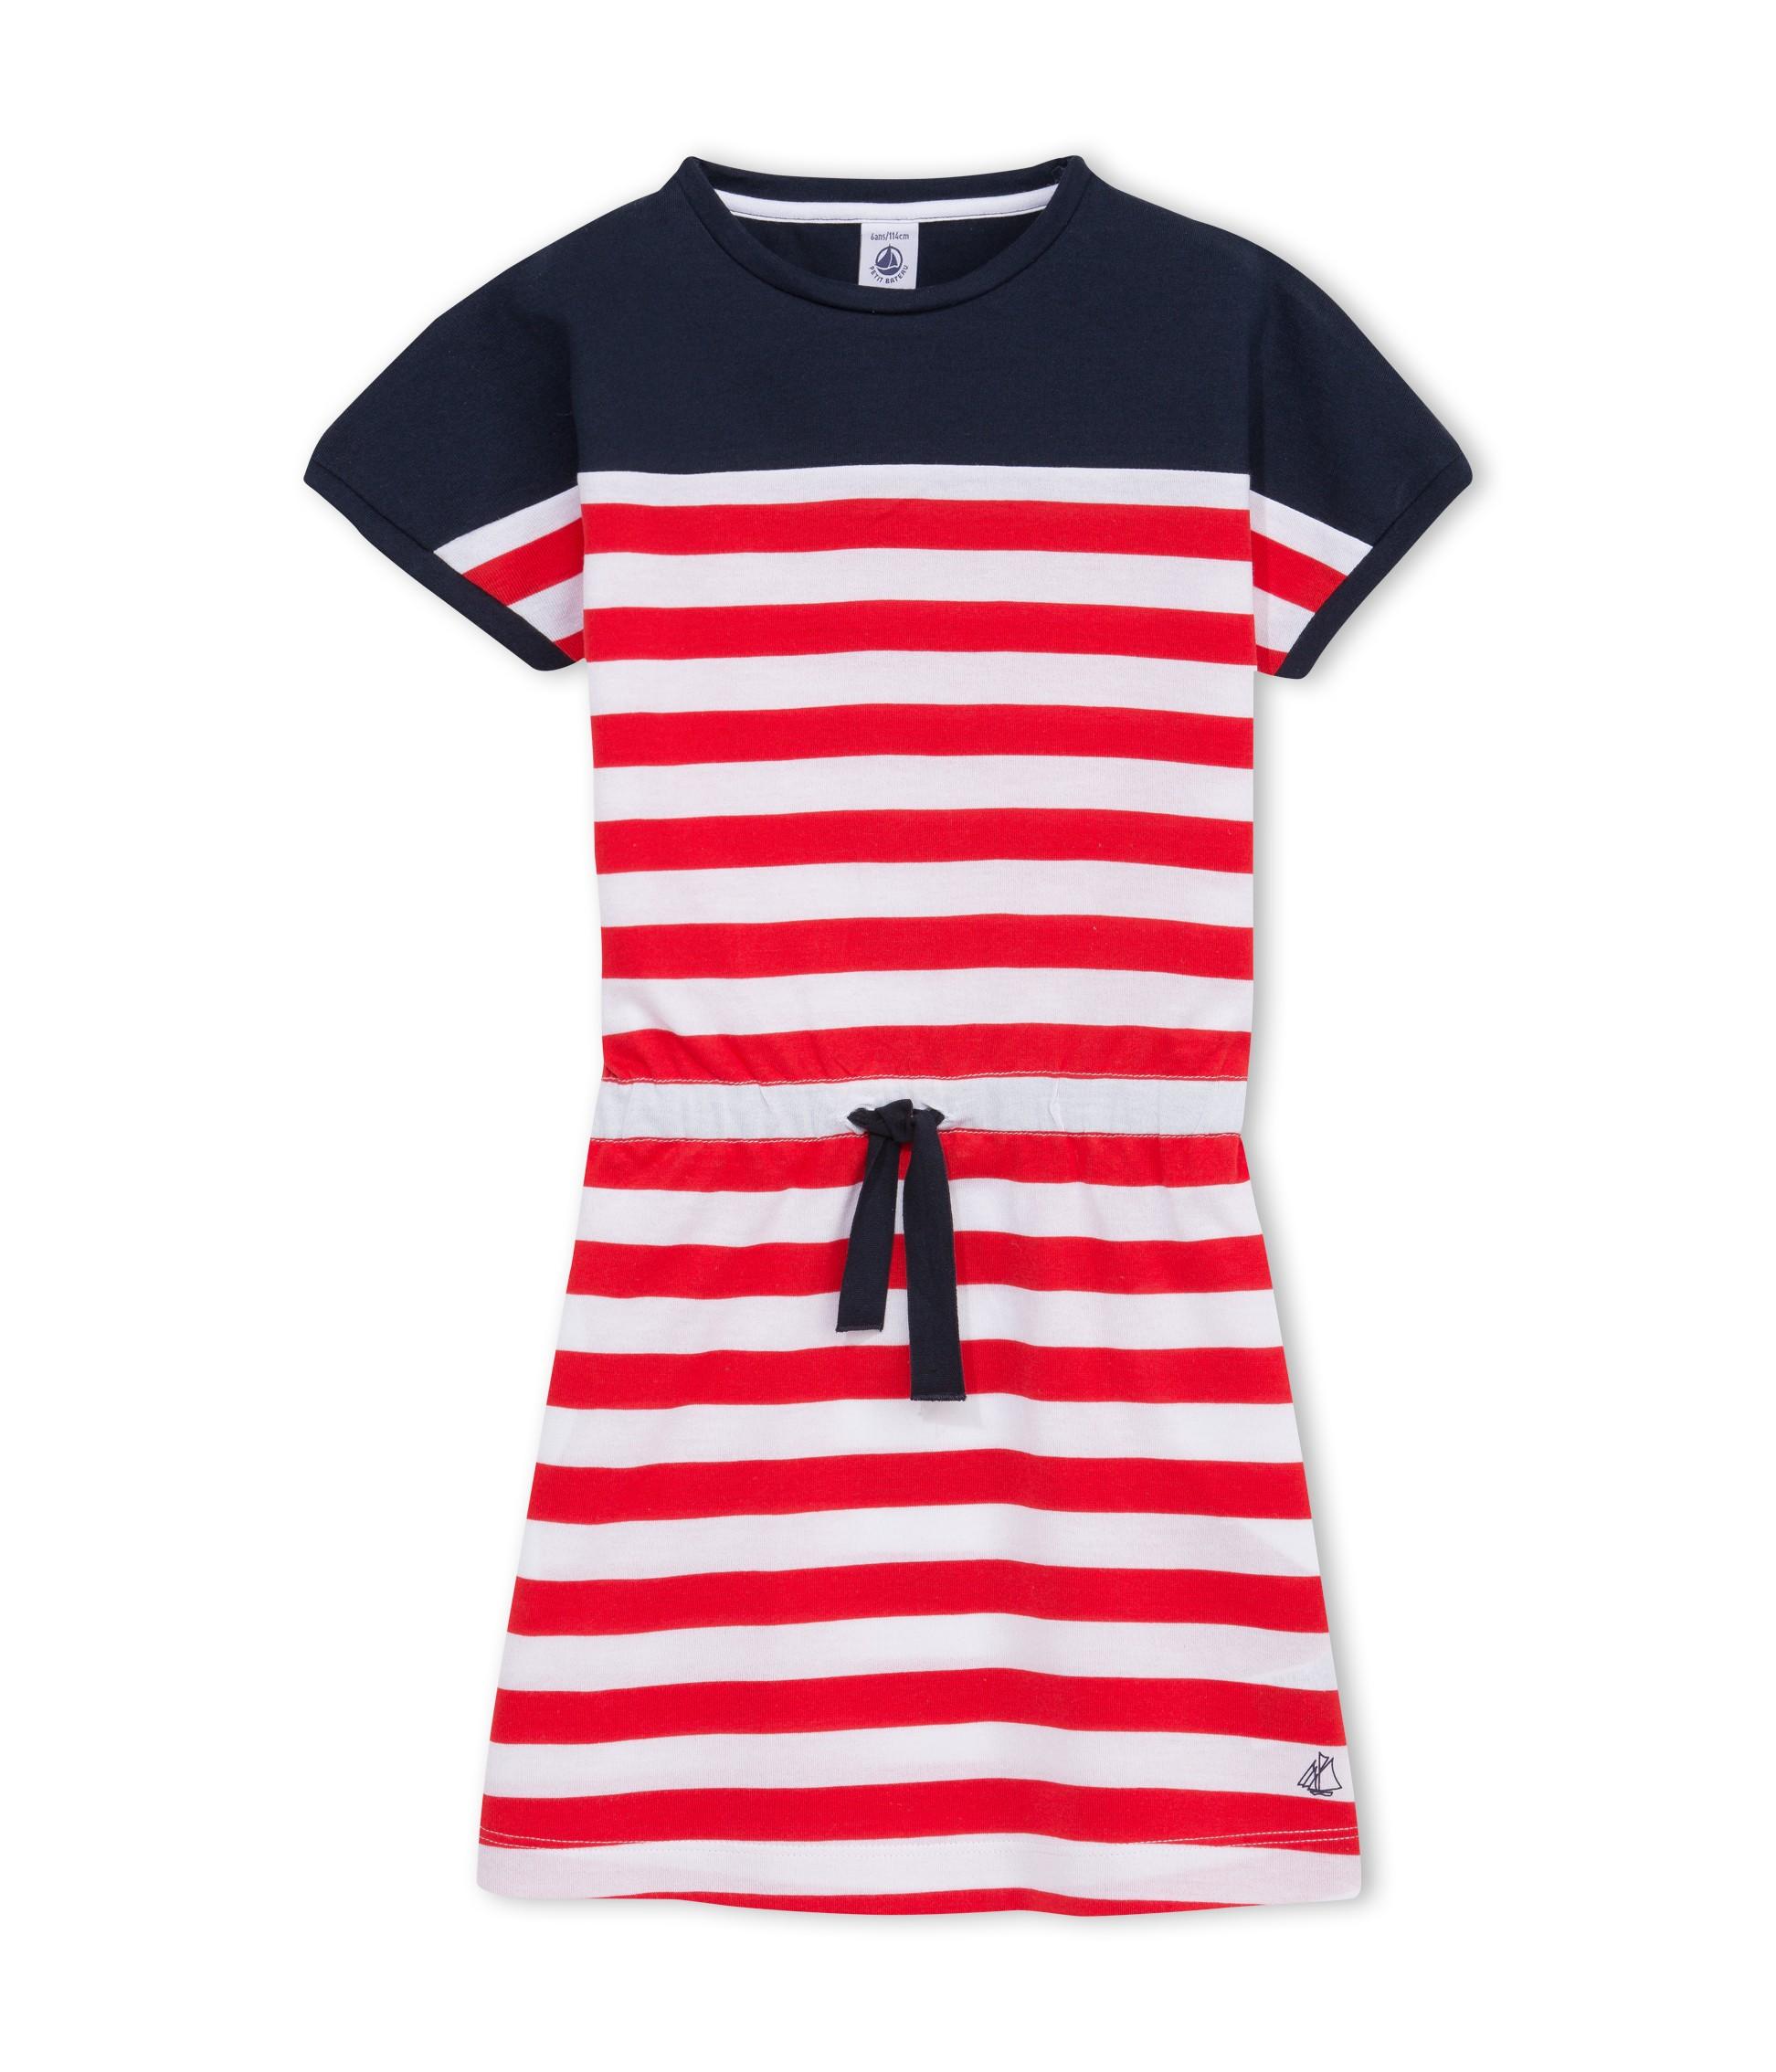 Robe mariniere rouge et bleu